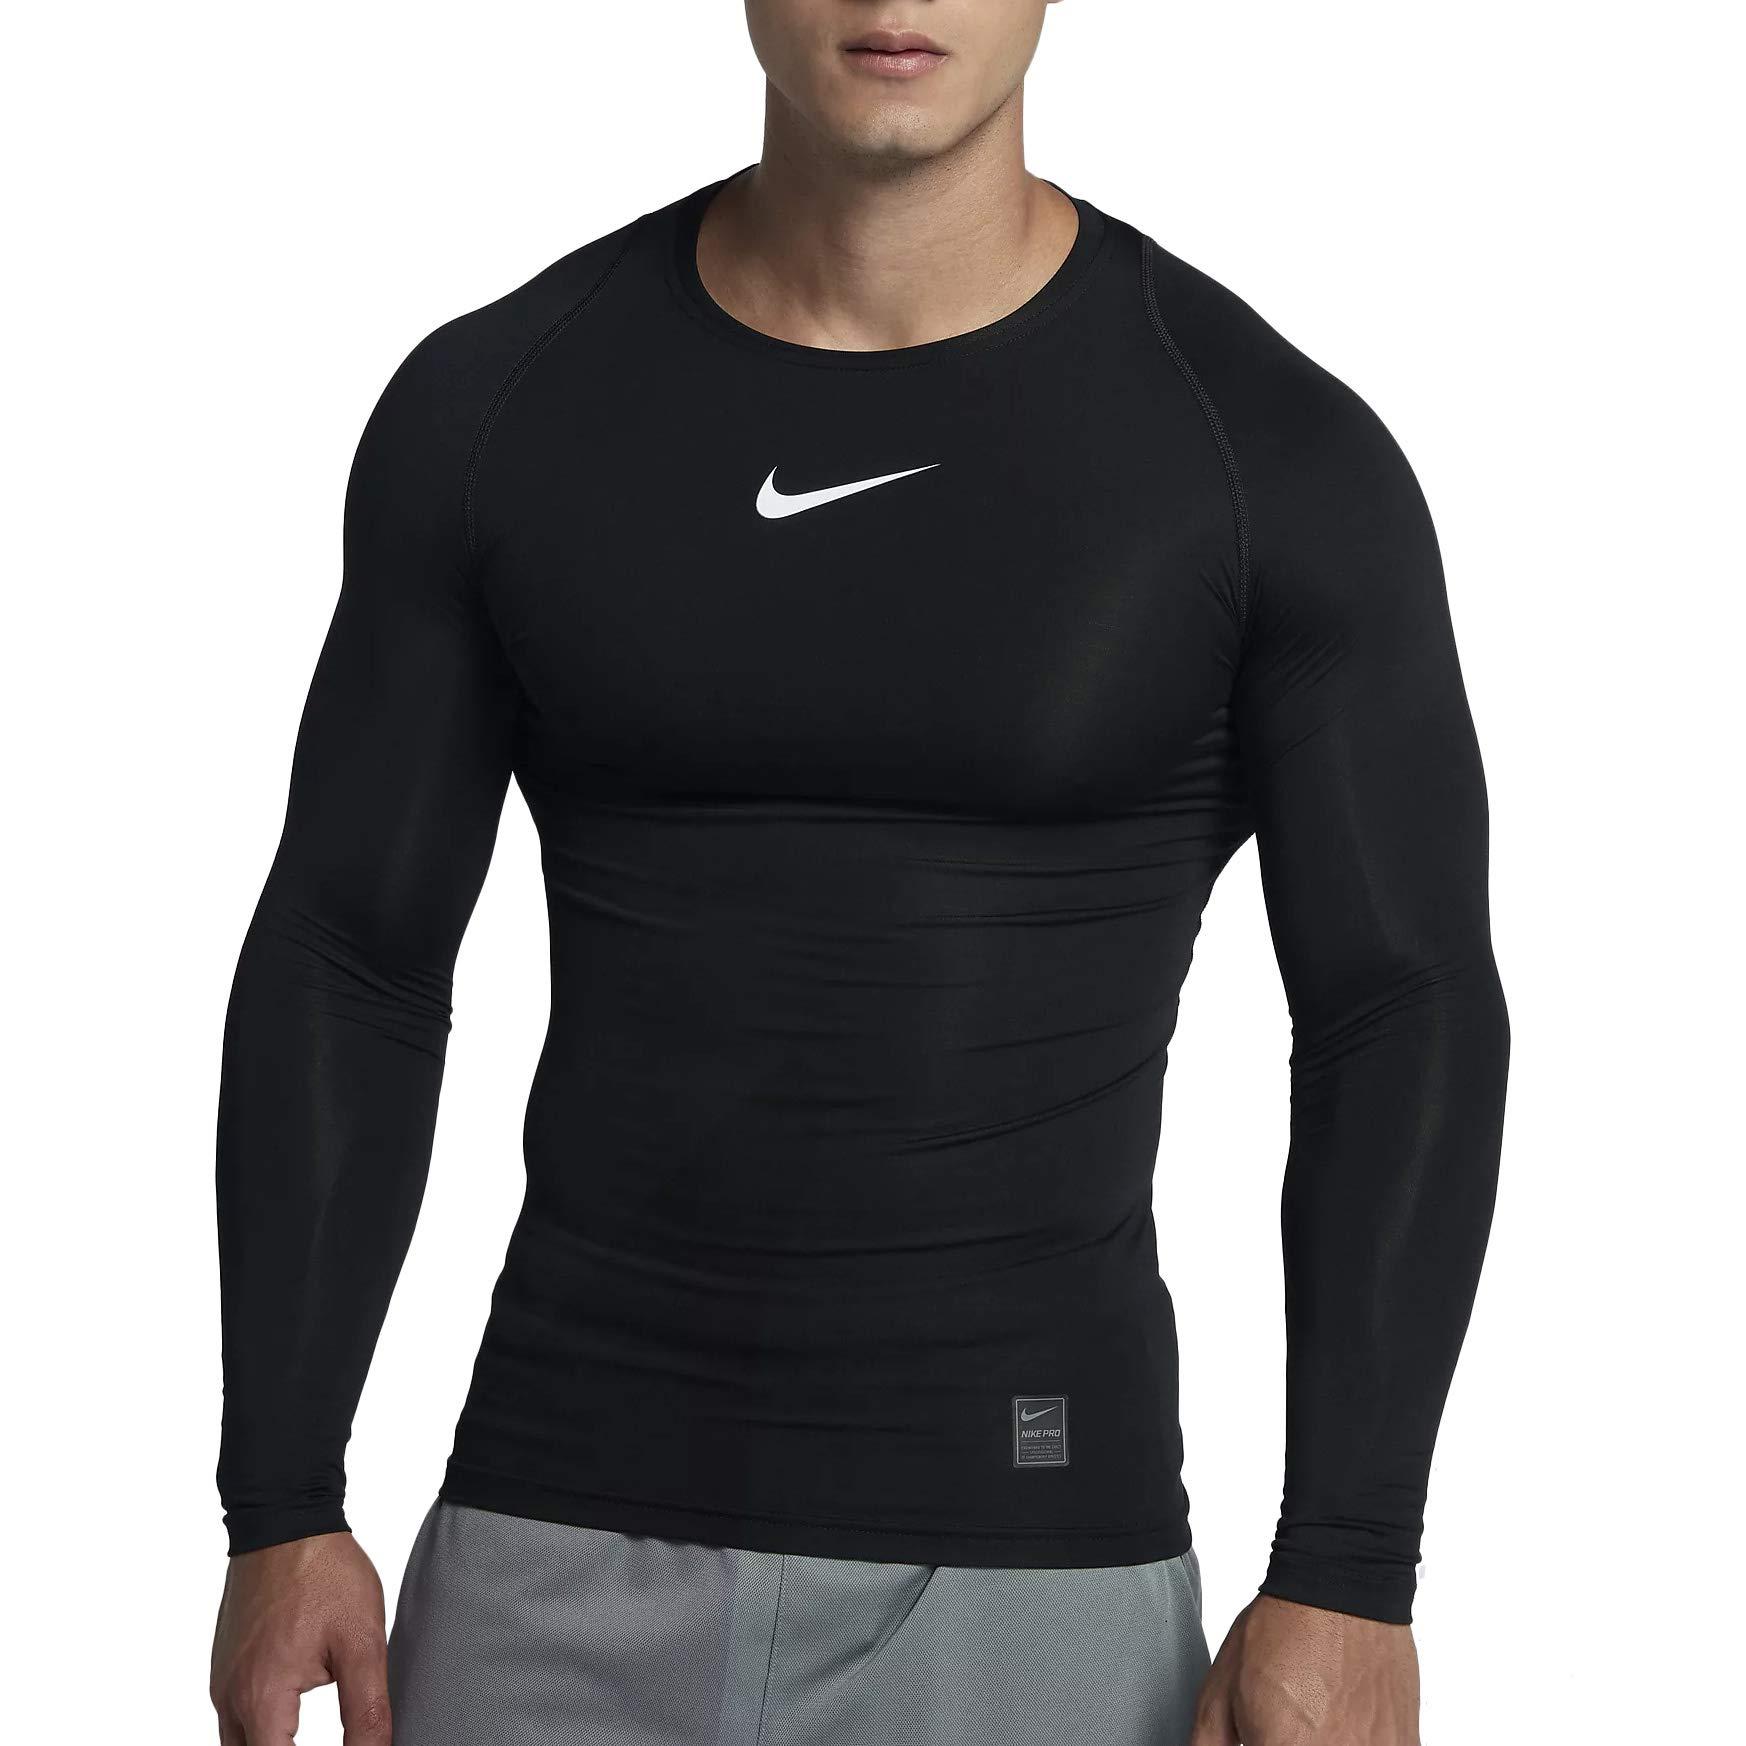 Nike Pro Longsleeve Compression Shirt